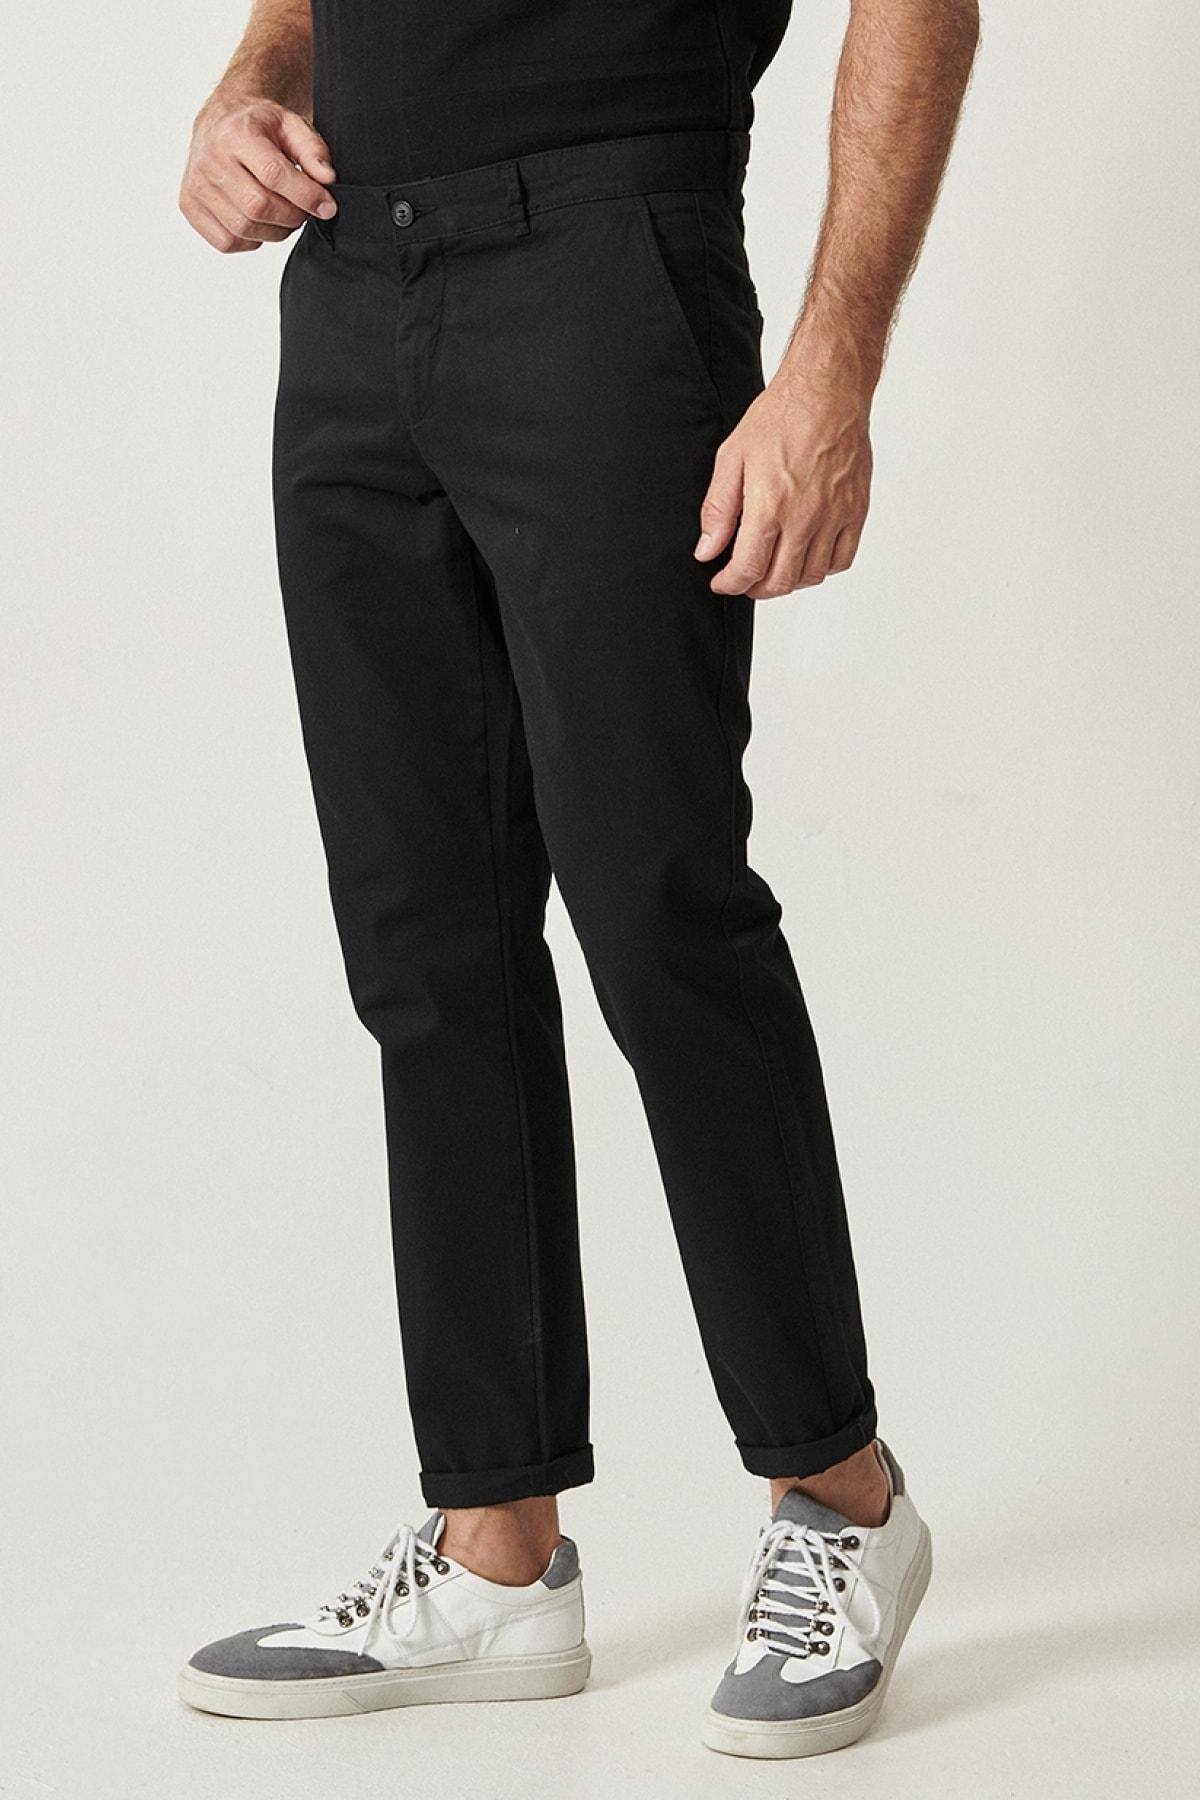 ALTINYILDIZ CLASSICS Erkek Siyah Kanvas Slim Fit Chino Pantolon 1